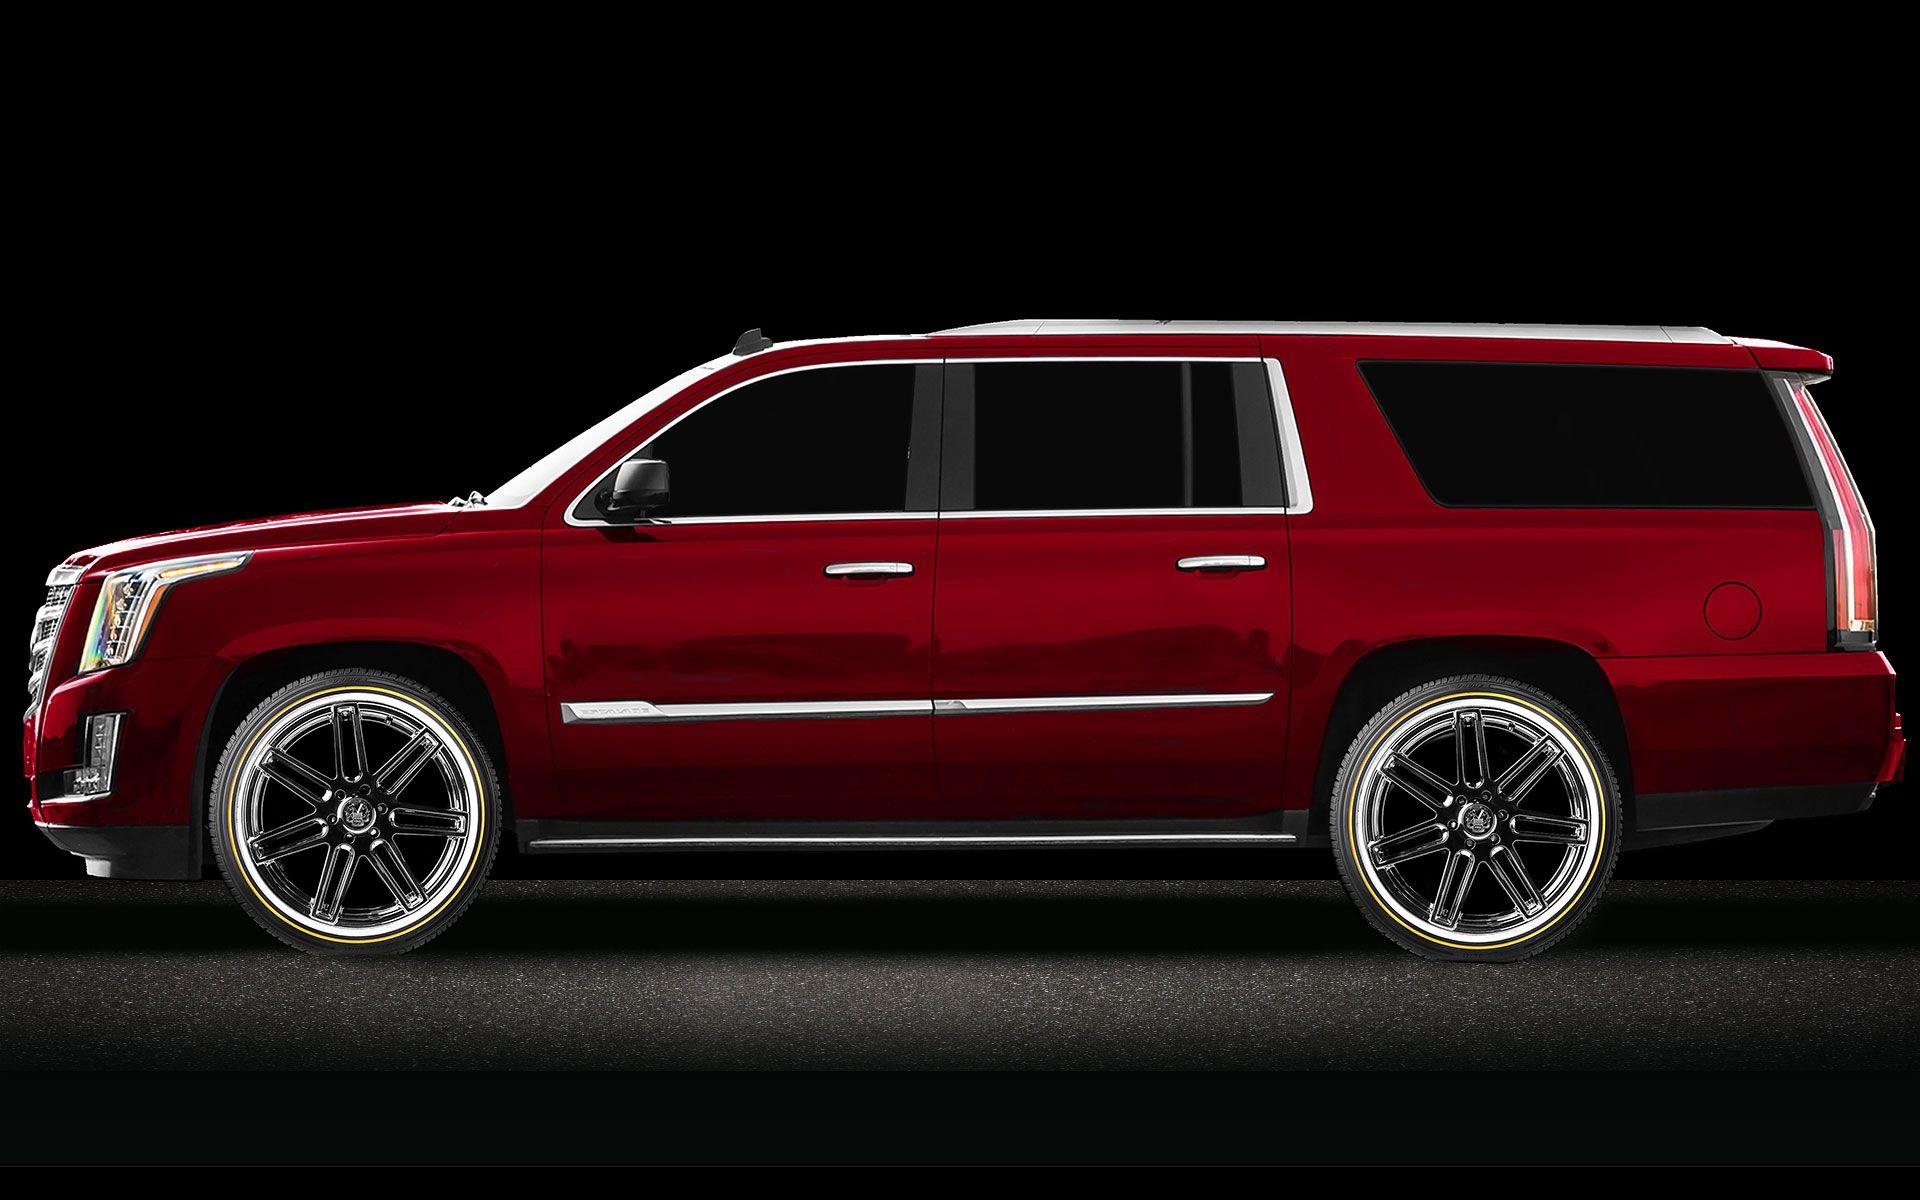 Www Hummer Limousine Car Wallpapers Com 2016 Cadillac Escalade Images Hd Wallpaper Desktop Cool